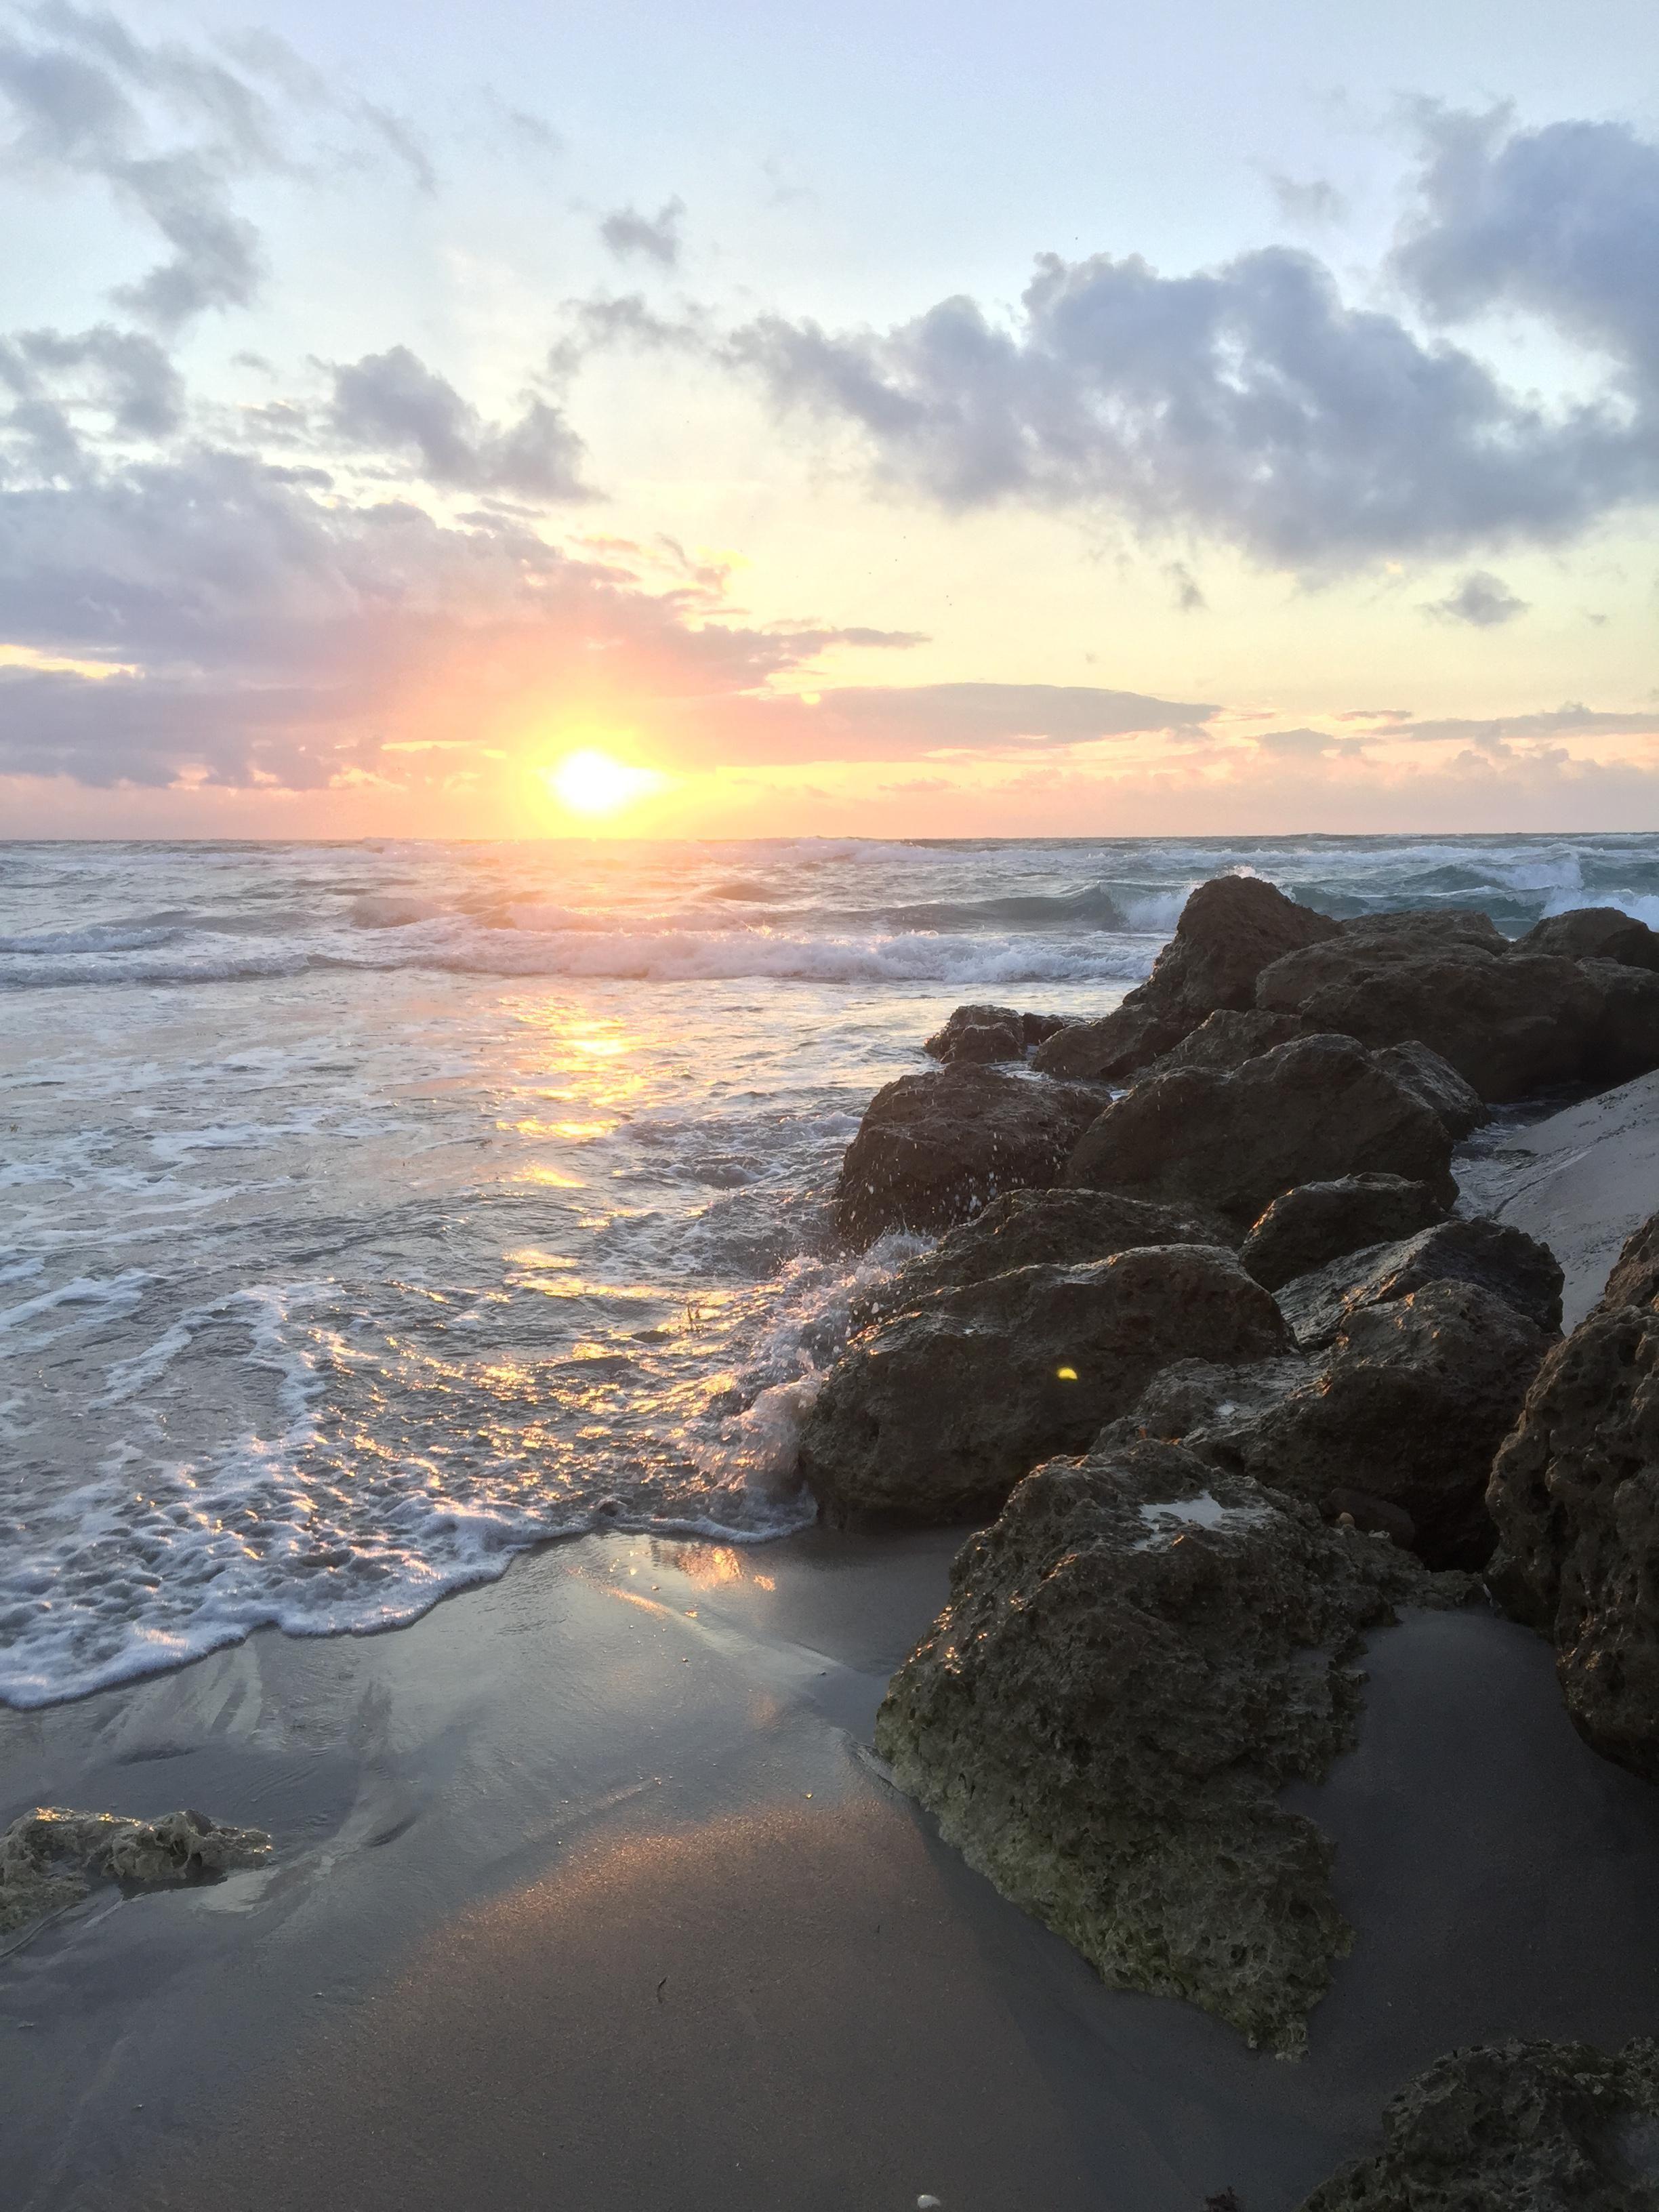 Sunrise In Palm Beach Florida 1920 X 1080 Oc Sunrise Photography Beach Sunrise Beach Beautiful Landscapes